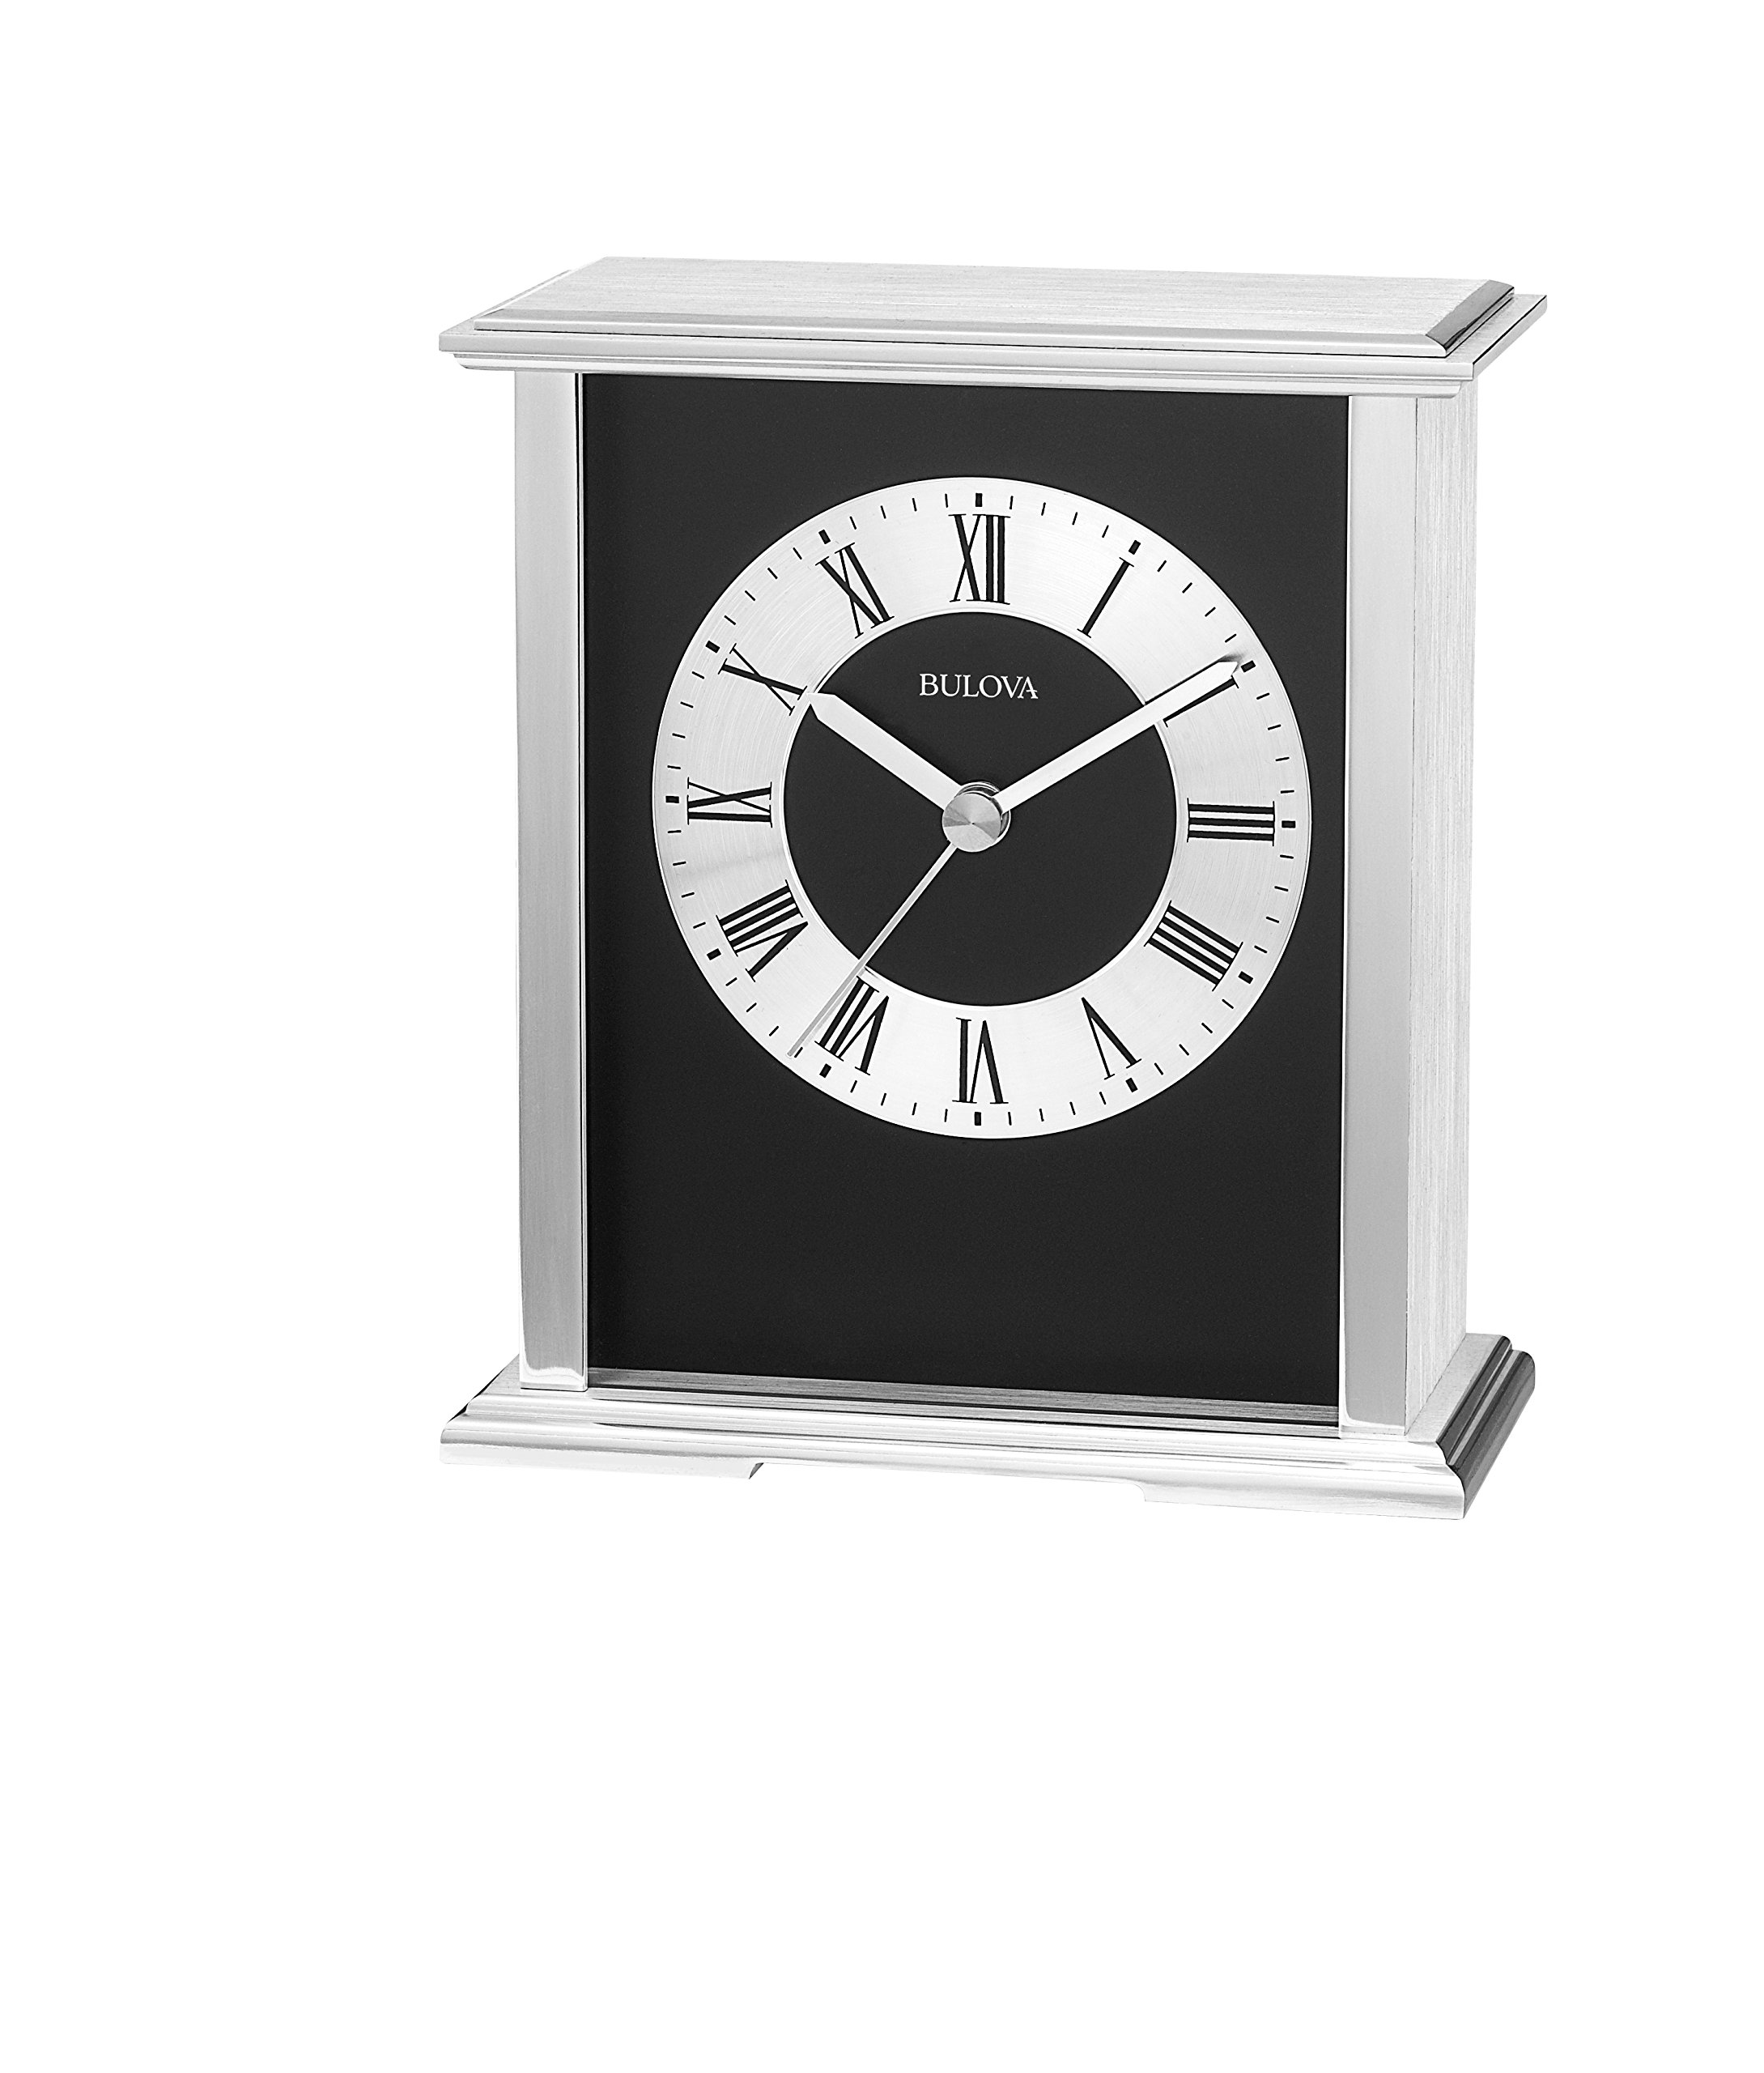 Bulova Baron Mantel/Tabletop Clock by Bulova